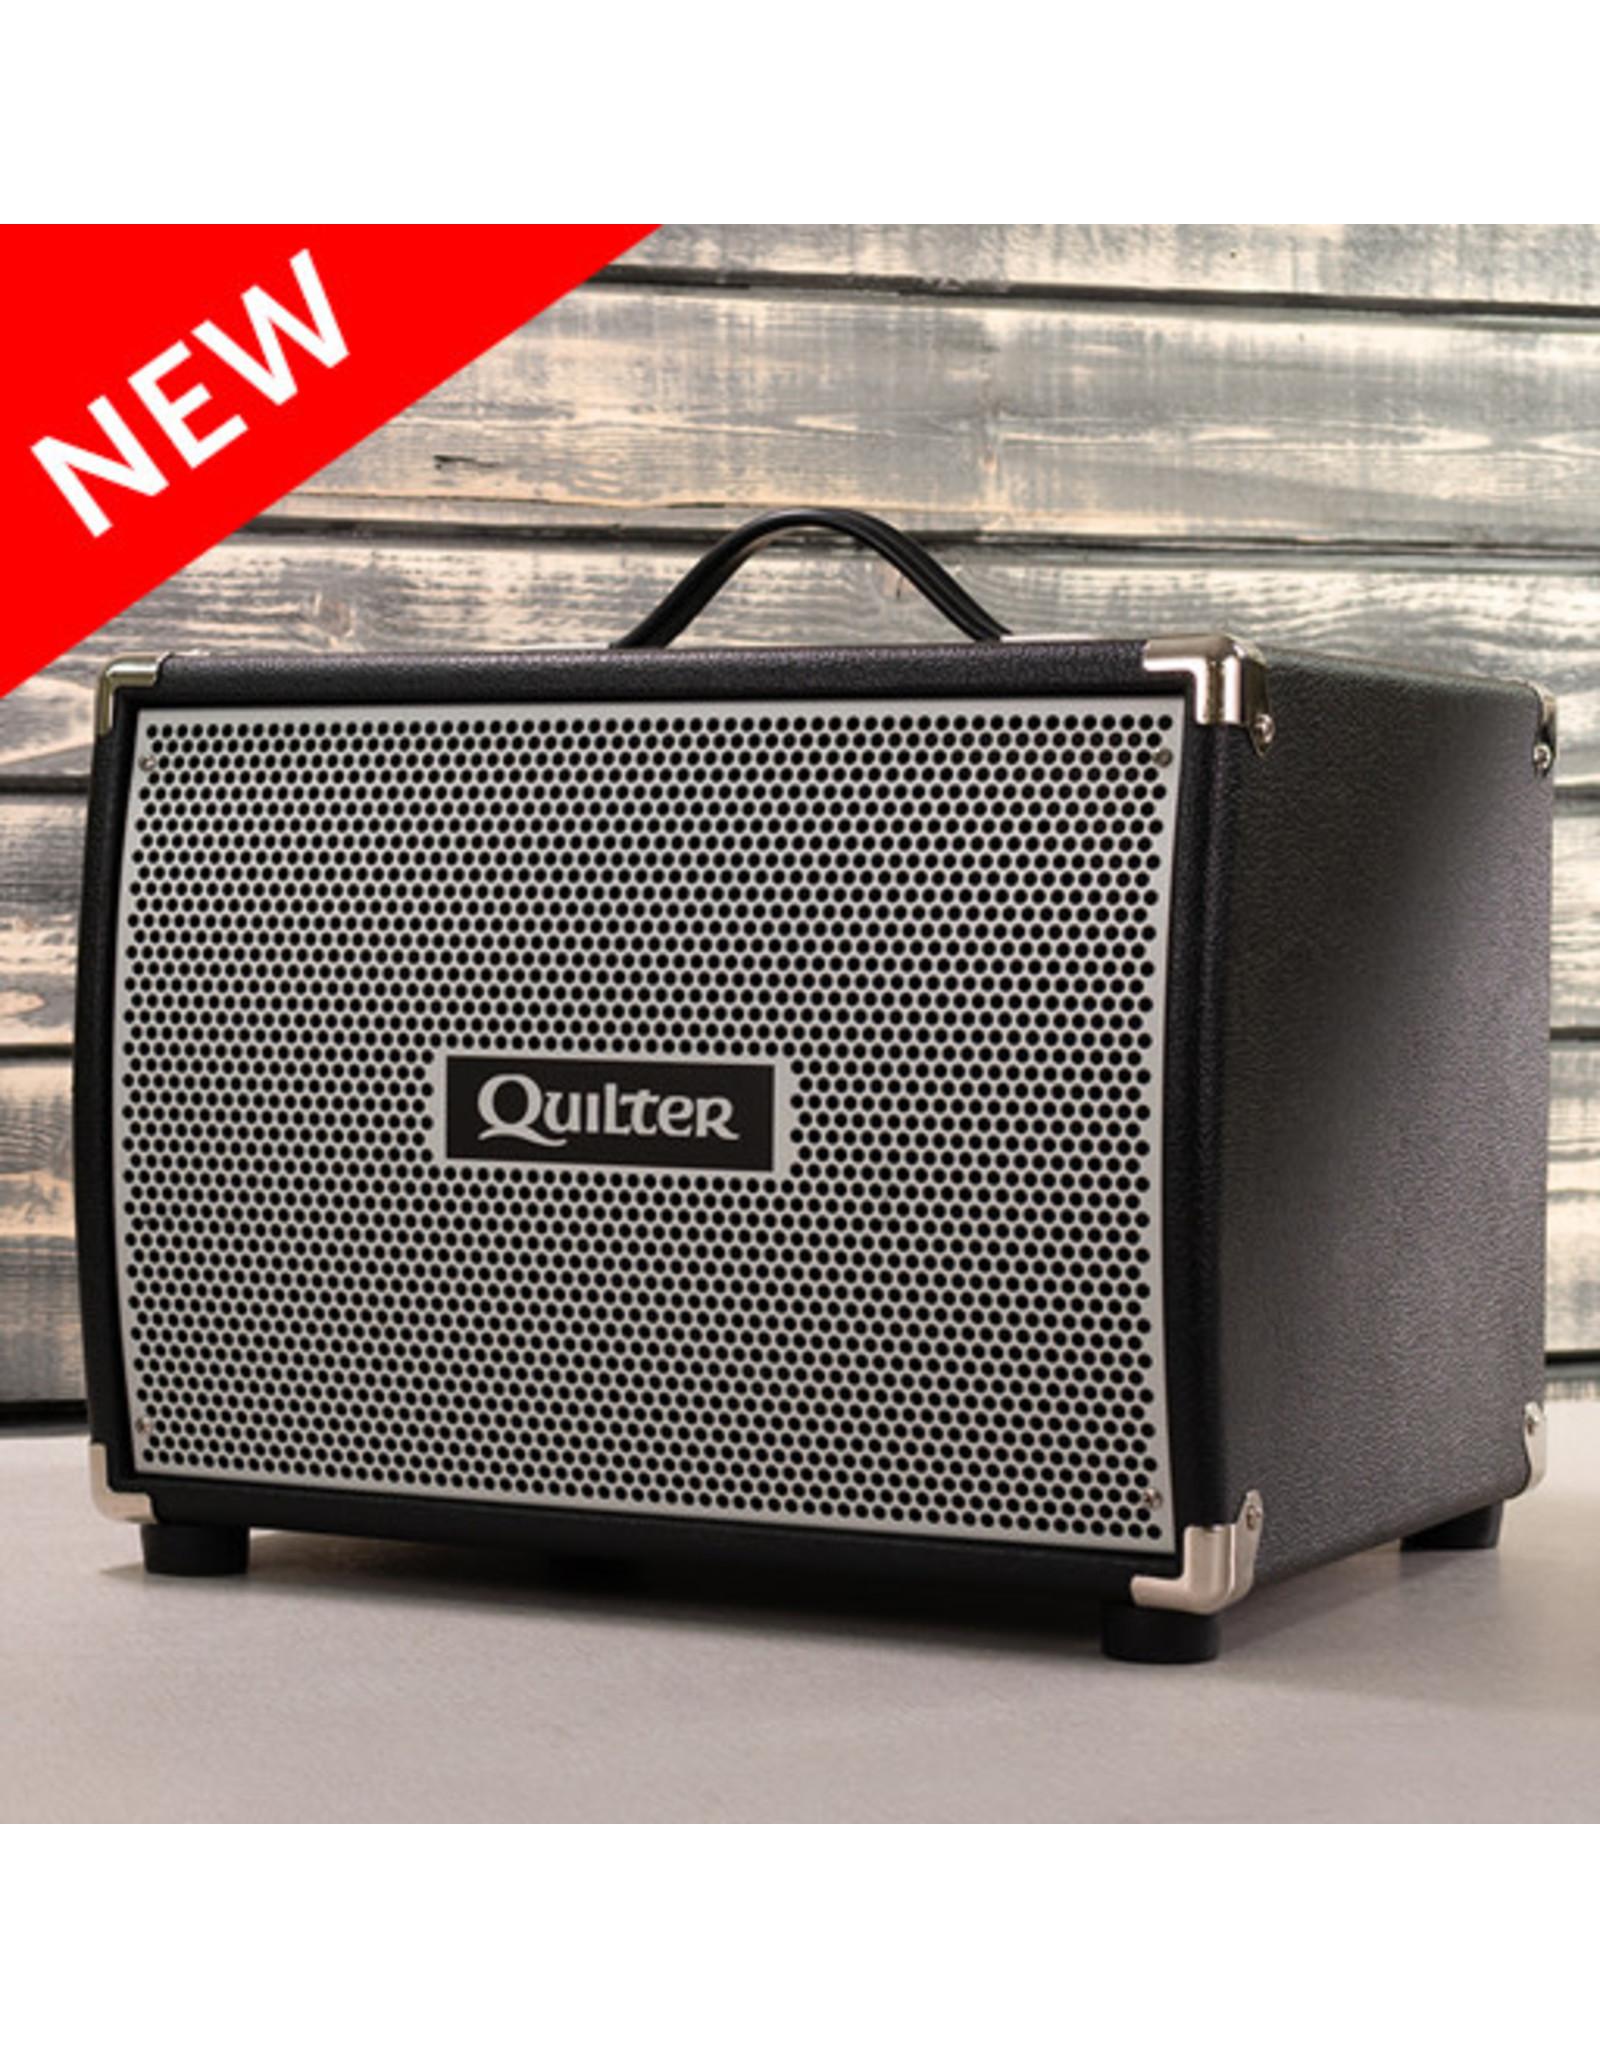 Quilter Quilter Bass Dock BD10